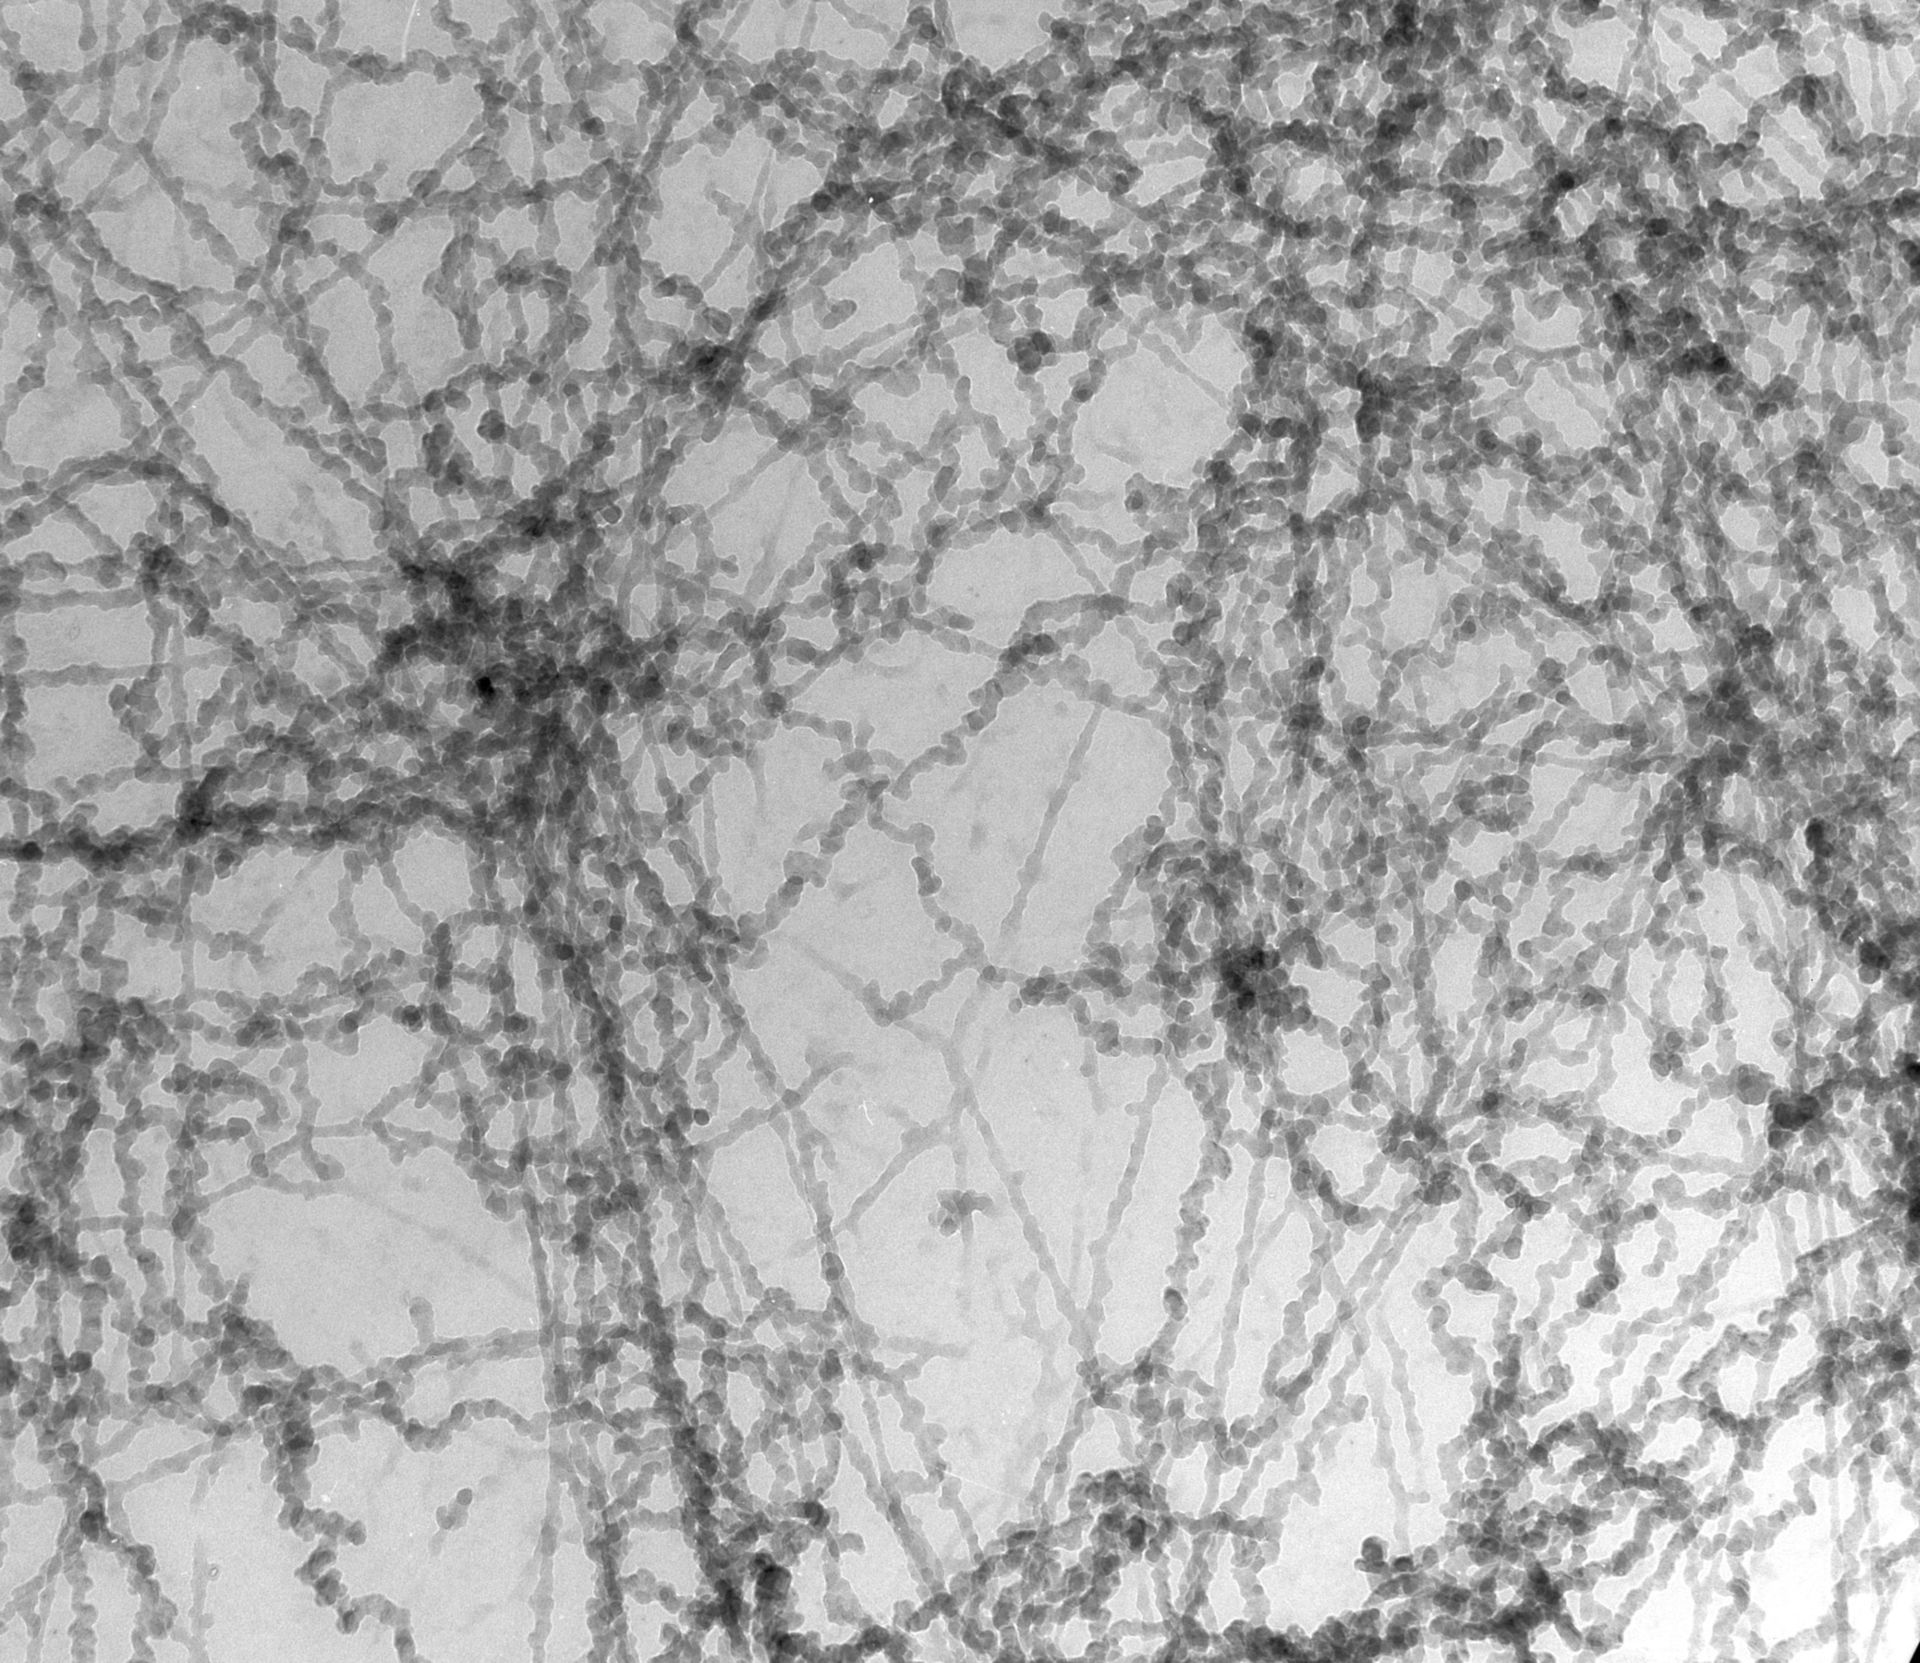 Notopthalmus viridescence (Nuclear chromatin) - CIL:10087